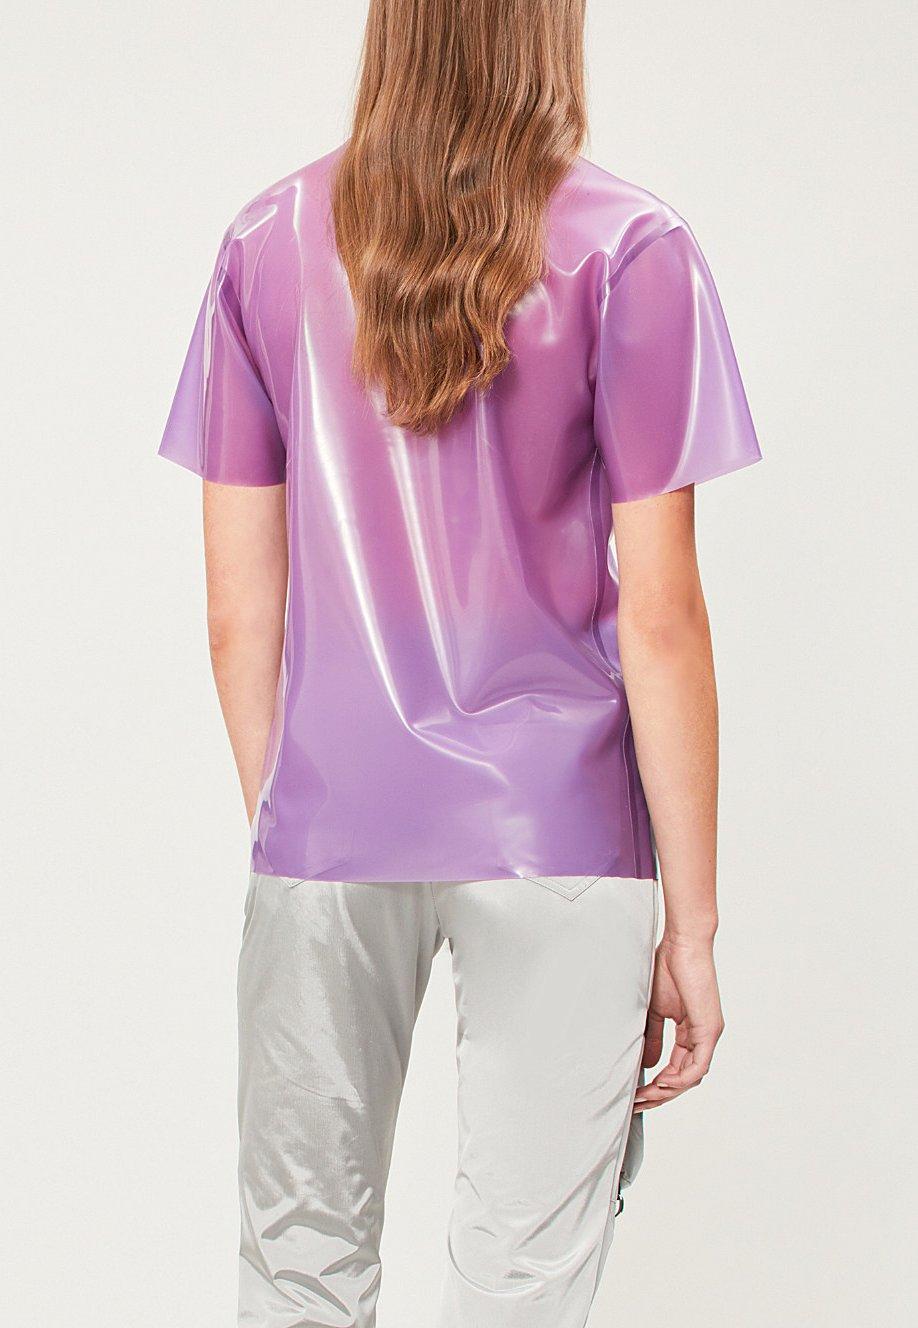 hanger selfridges purple t shirt-crop